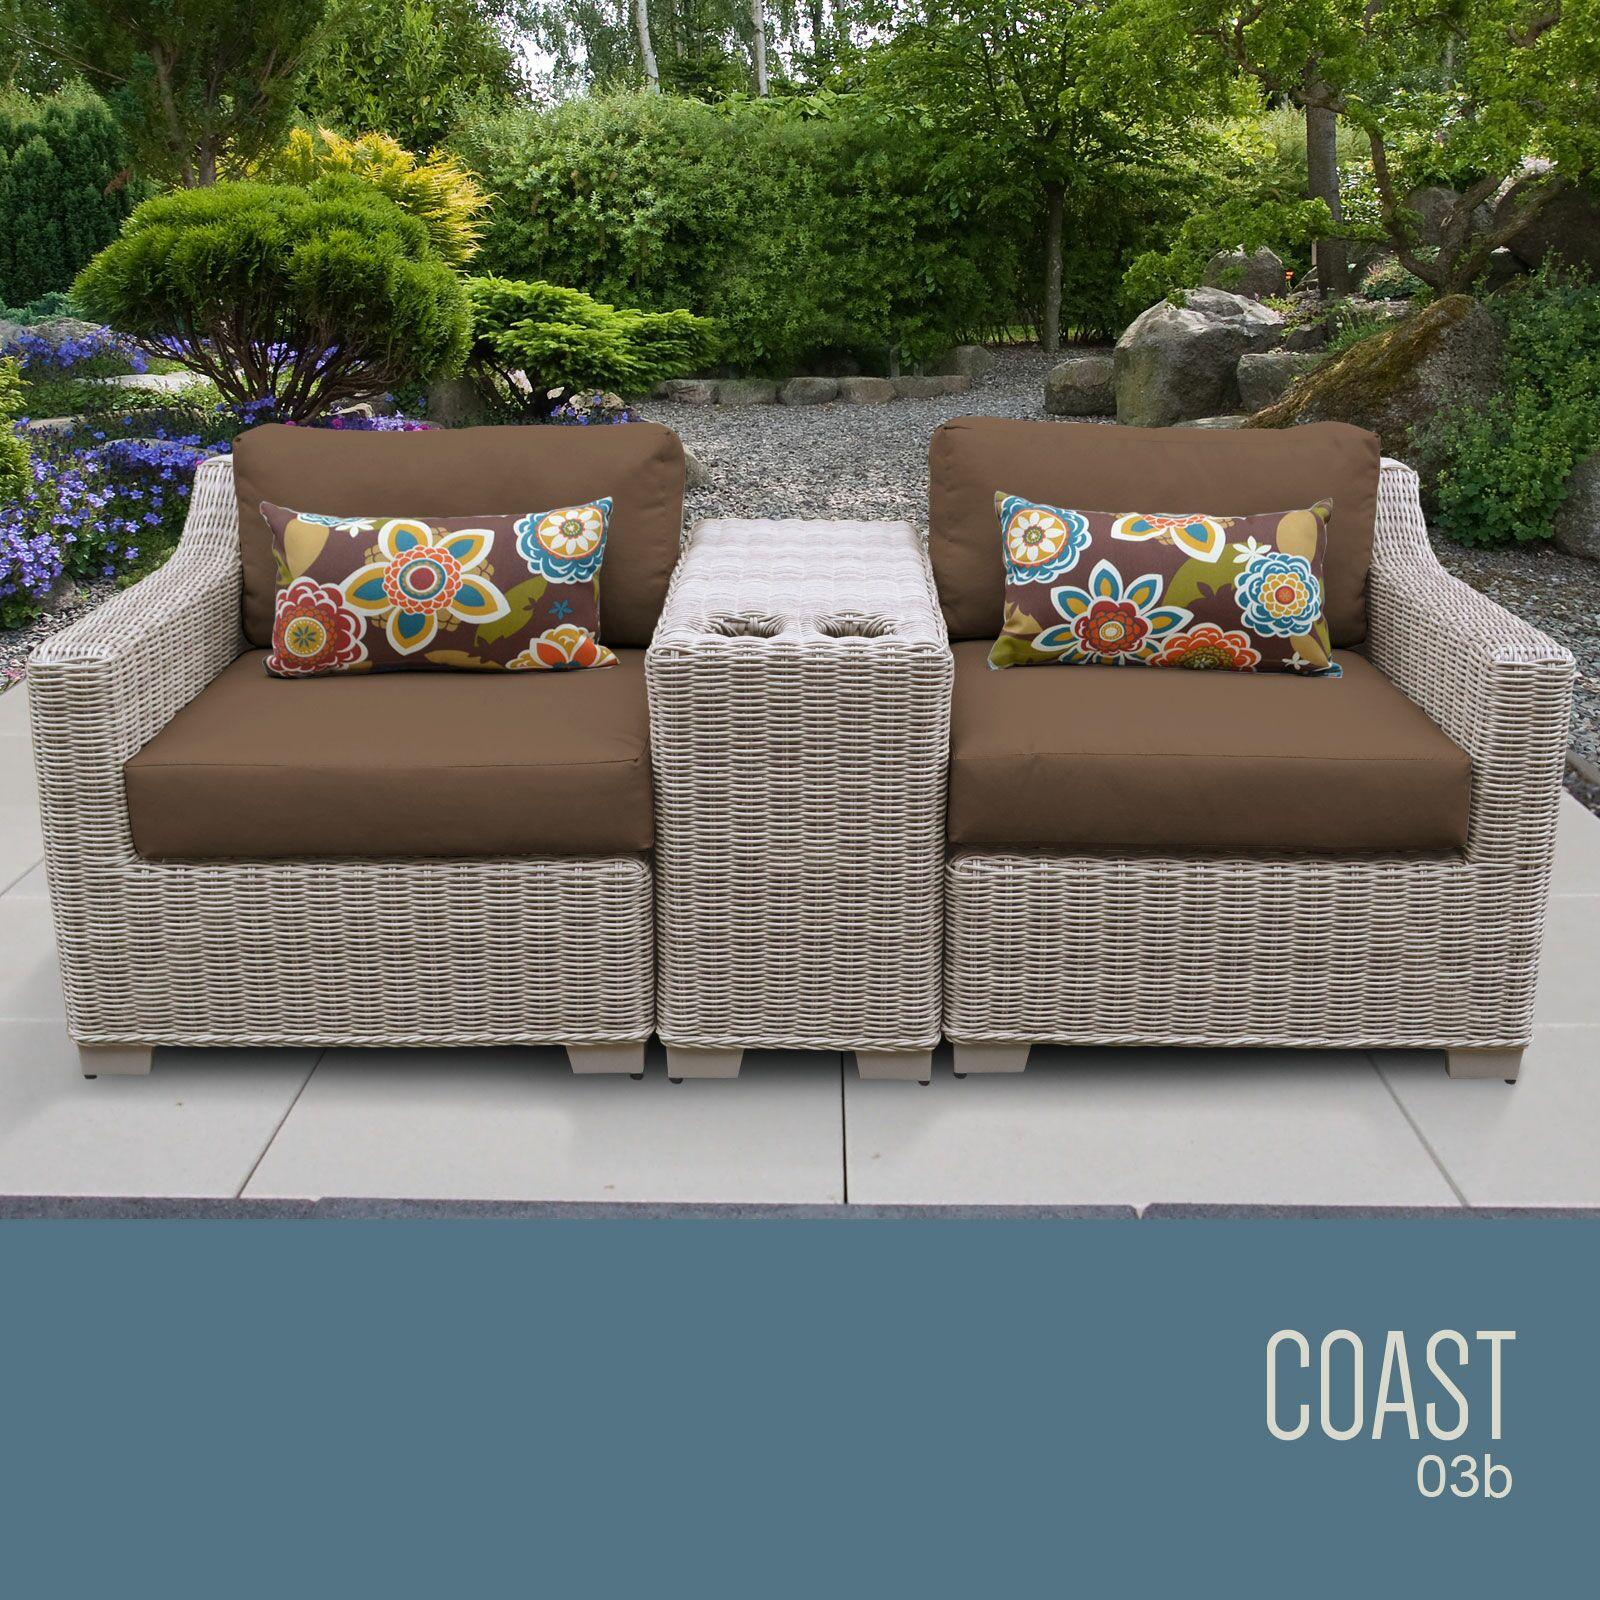 Coast 3 Piece Conversation Set with Cushions Cushion Color (Fabric): Cocoa